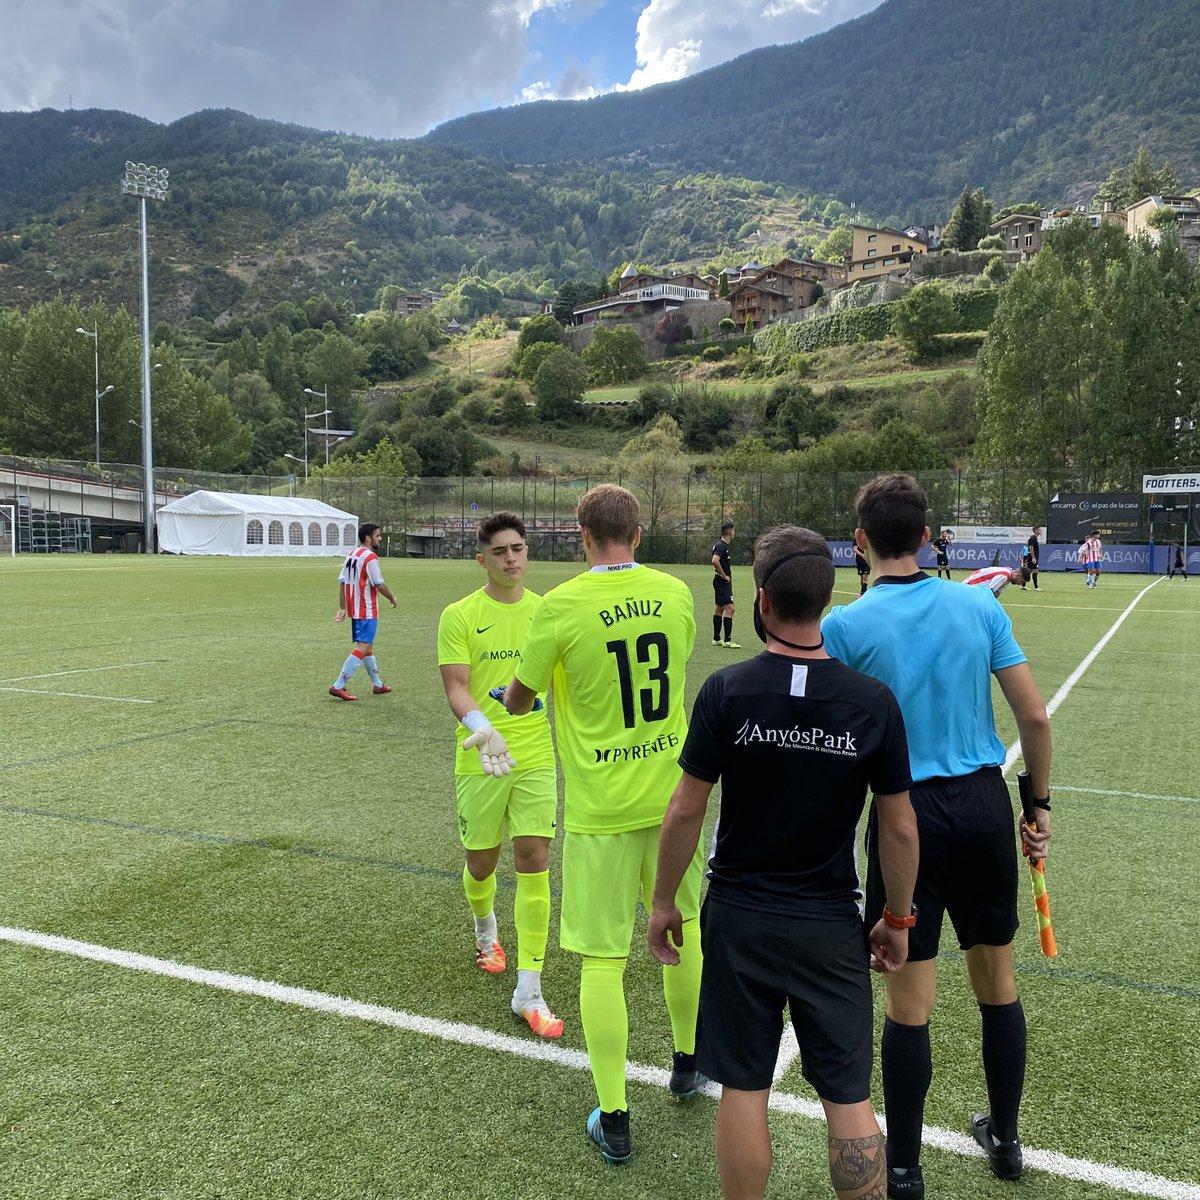 Min. 30 | 0-1 | 🔄 Canvi al @fcandorra   🔺 Entra @Miguelba26  🔻 Marxa @Diego_Huesca   #AndorraMartorell #SomTricolors🔵🟡🔴 #MésViusQueMai